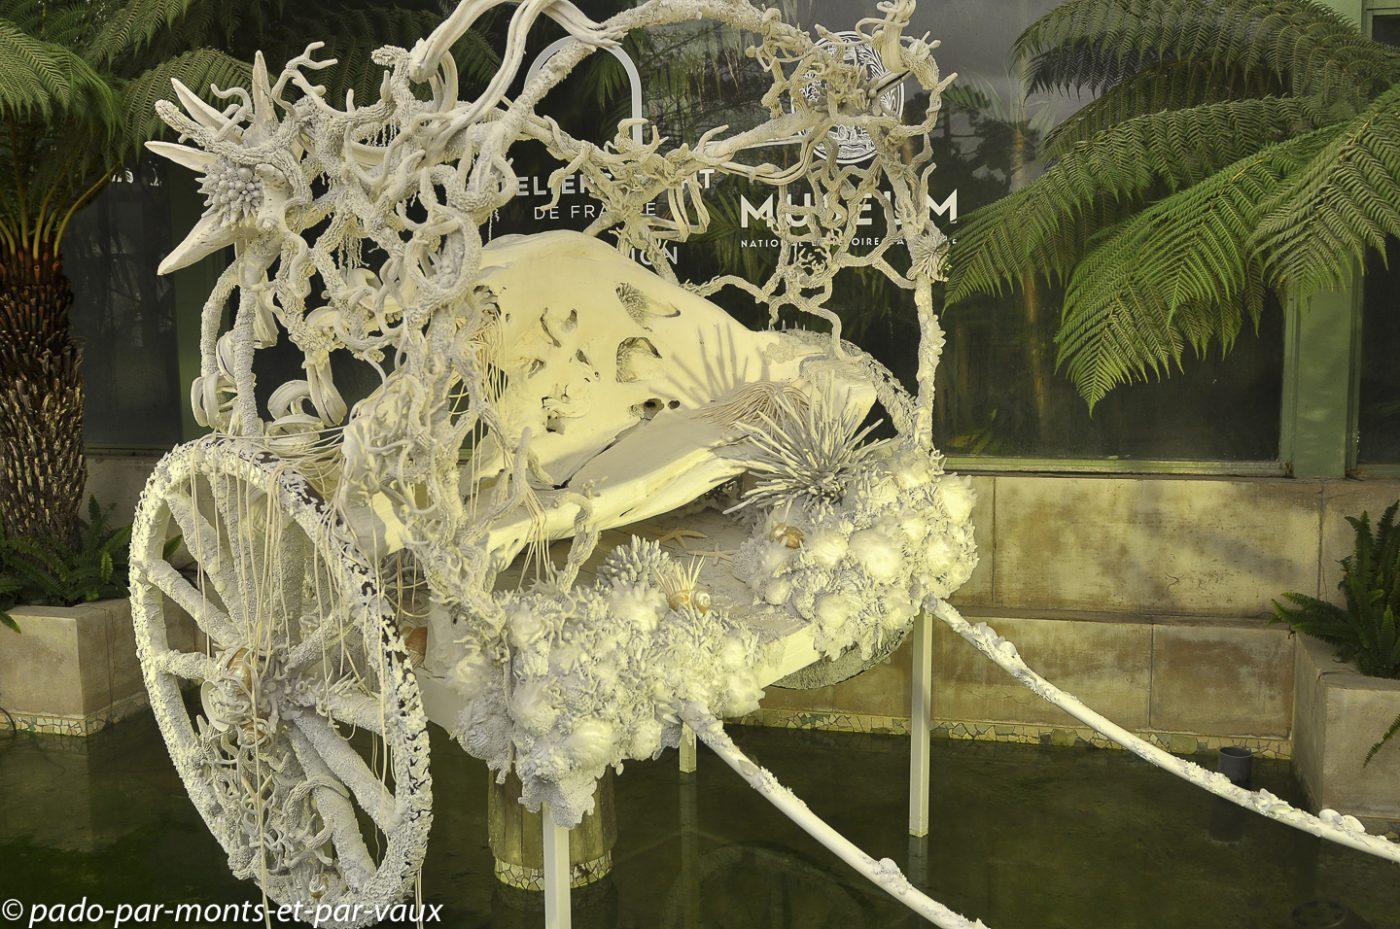 Jardin des plantes - Paris - exposition Tzuri Gueta